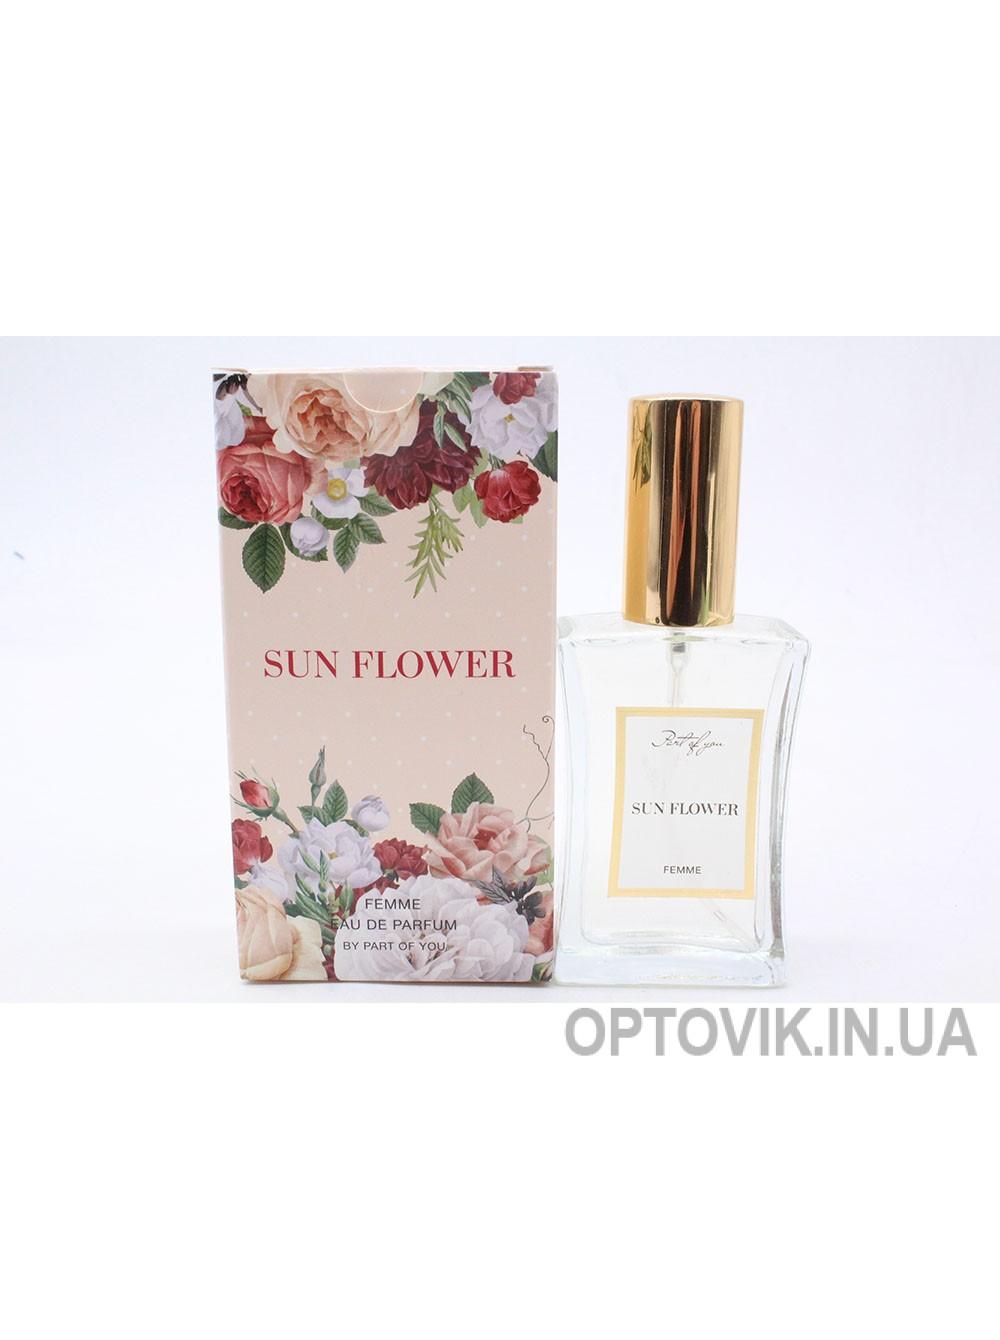 Женский парфюм тестер: Flor del sol escada type 60мл